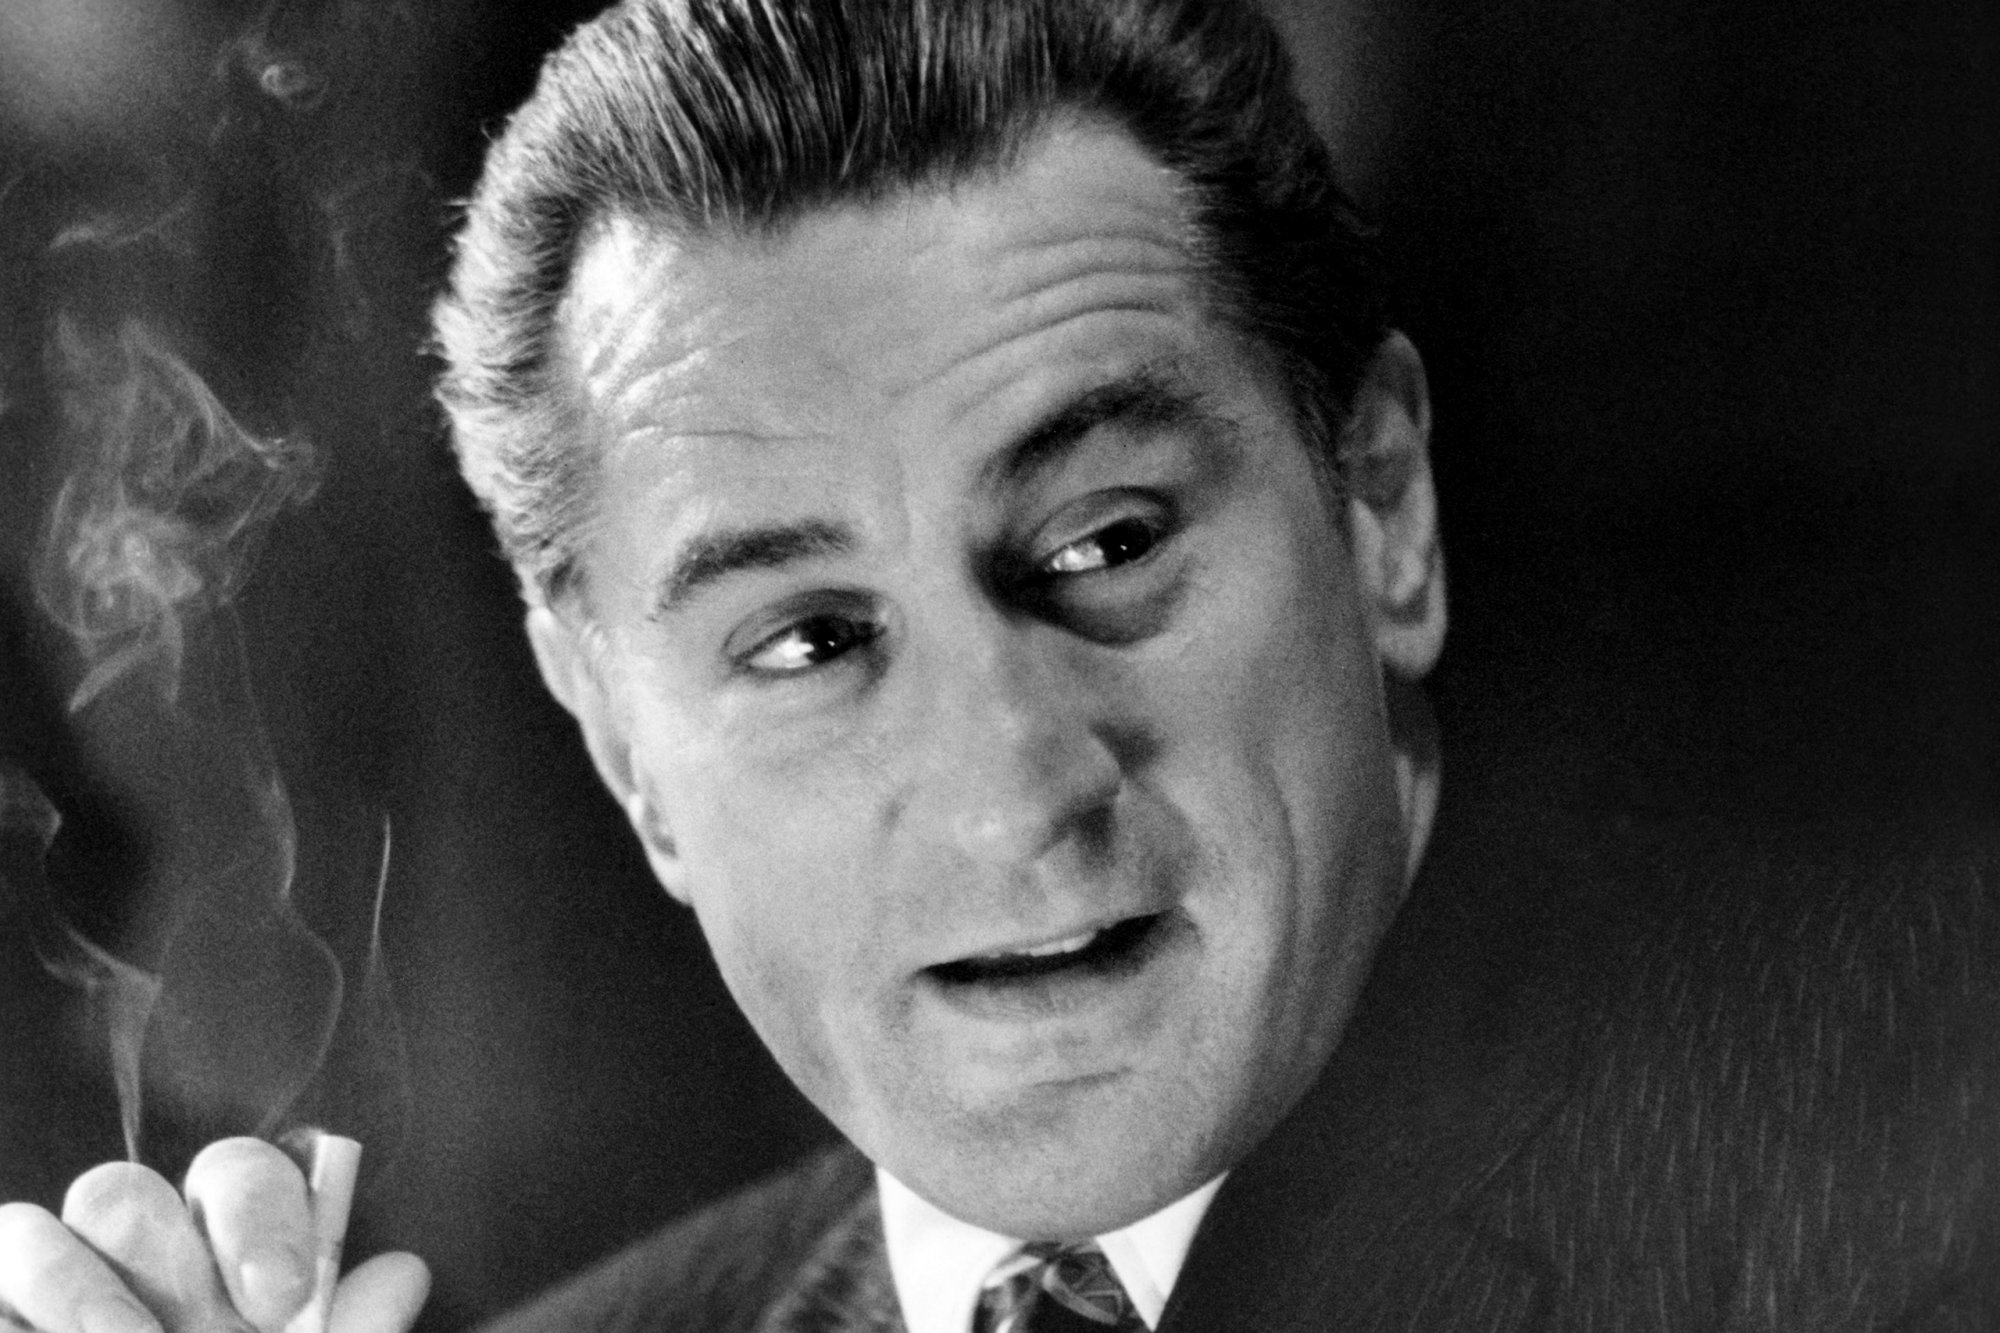 Robert De Niro Widescreen